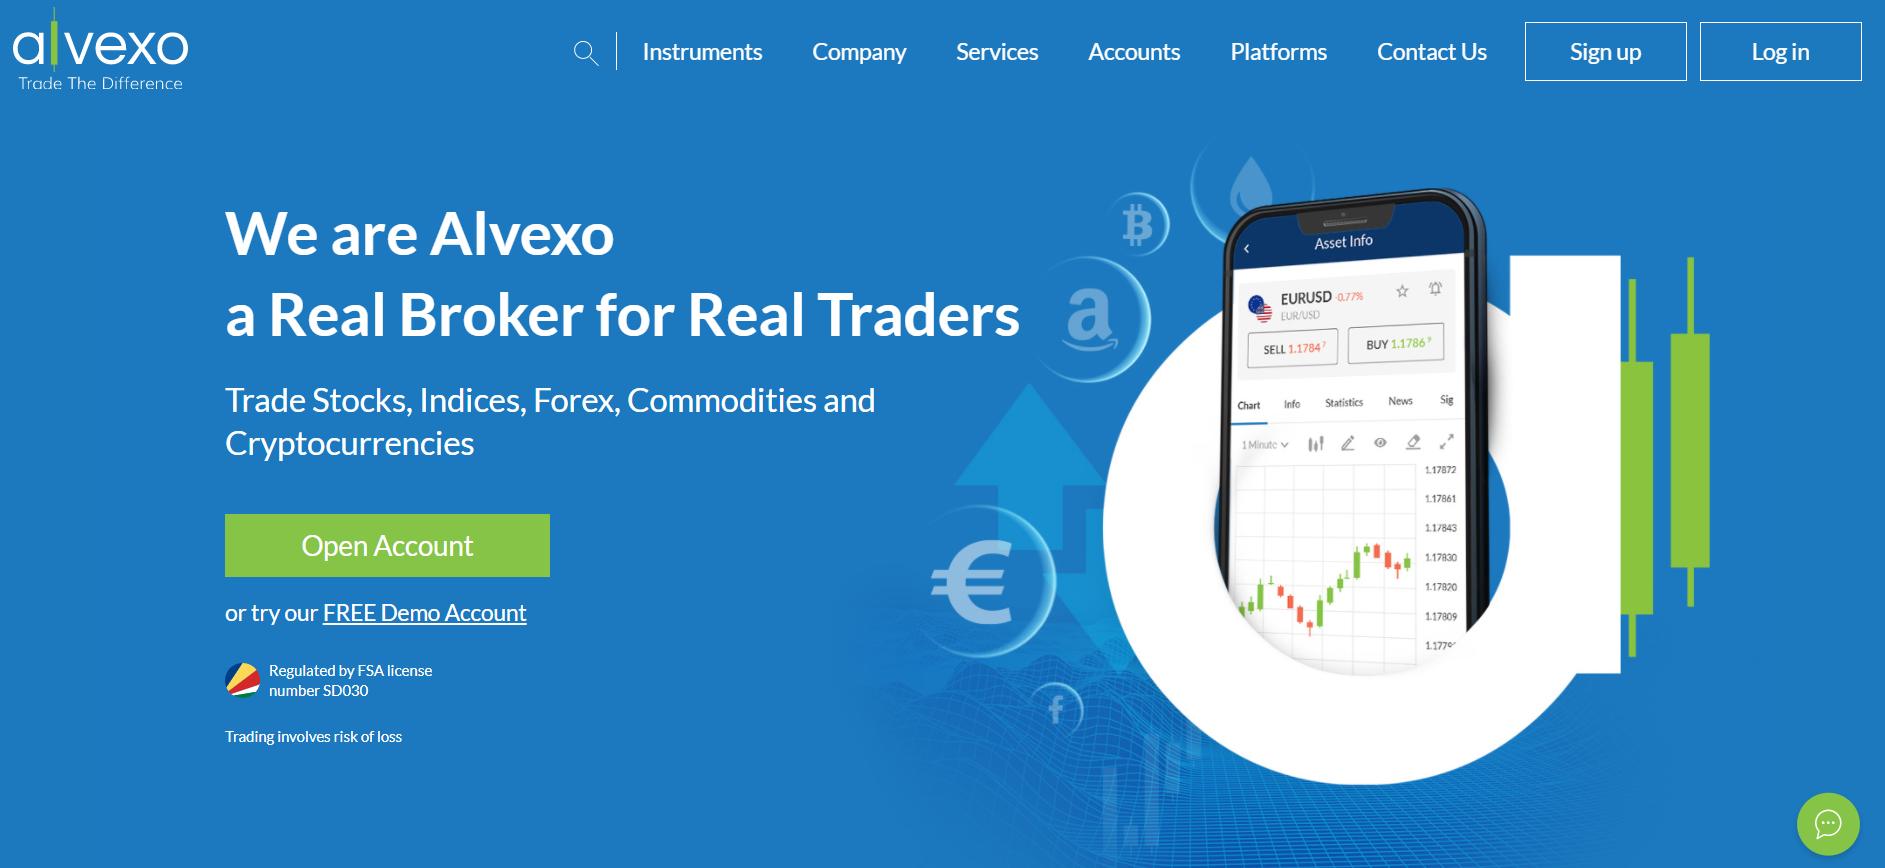 What is Alvexo